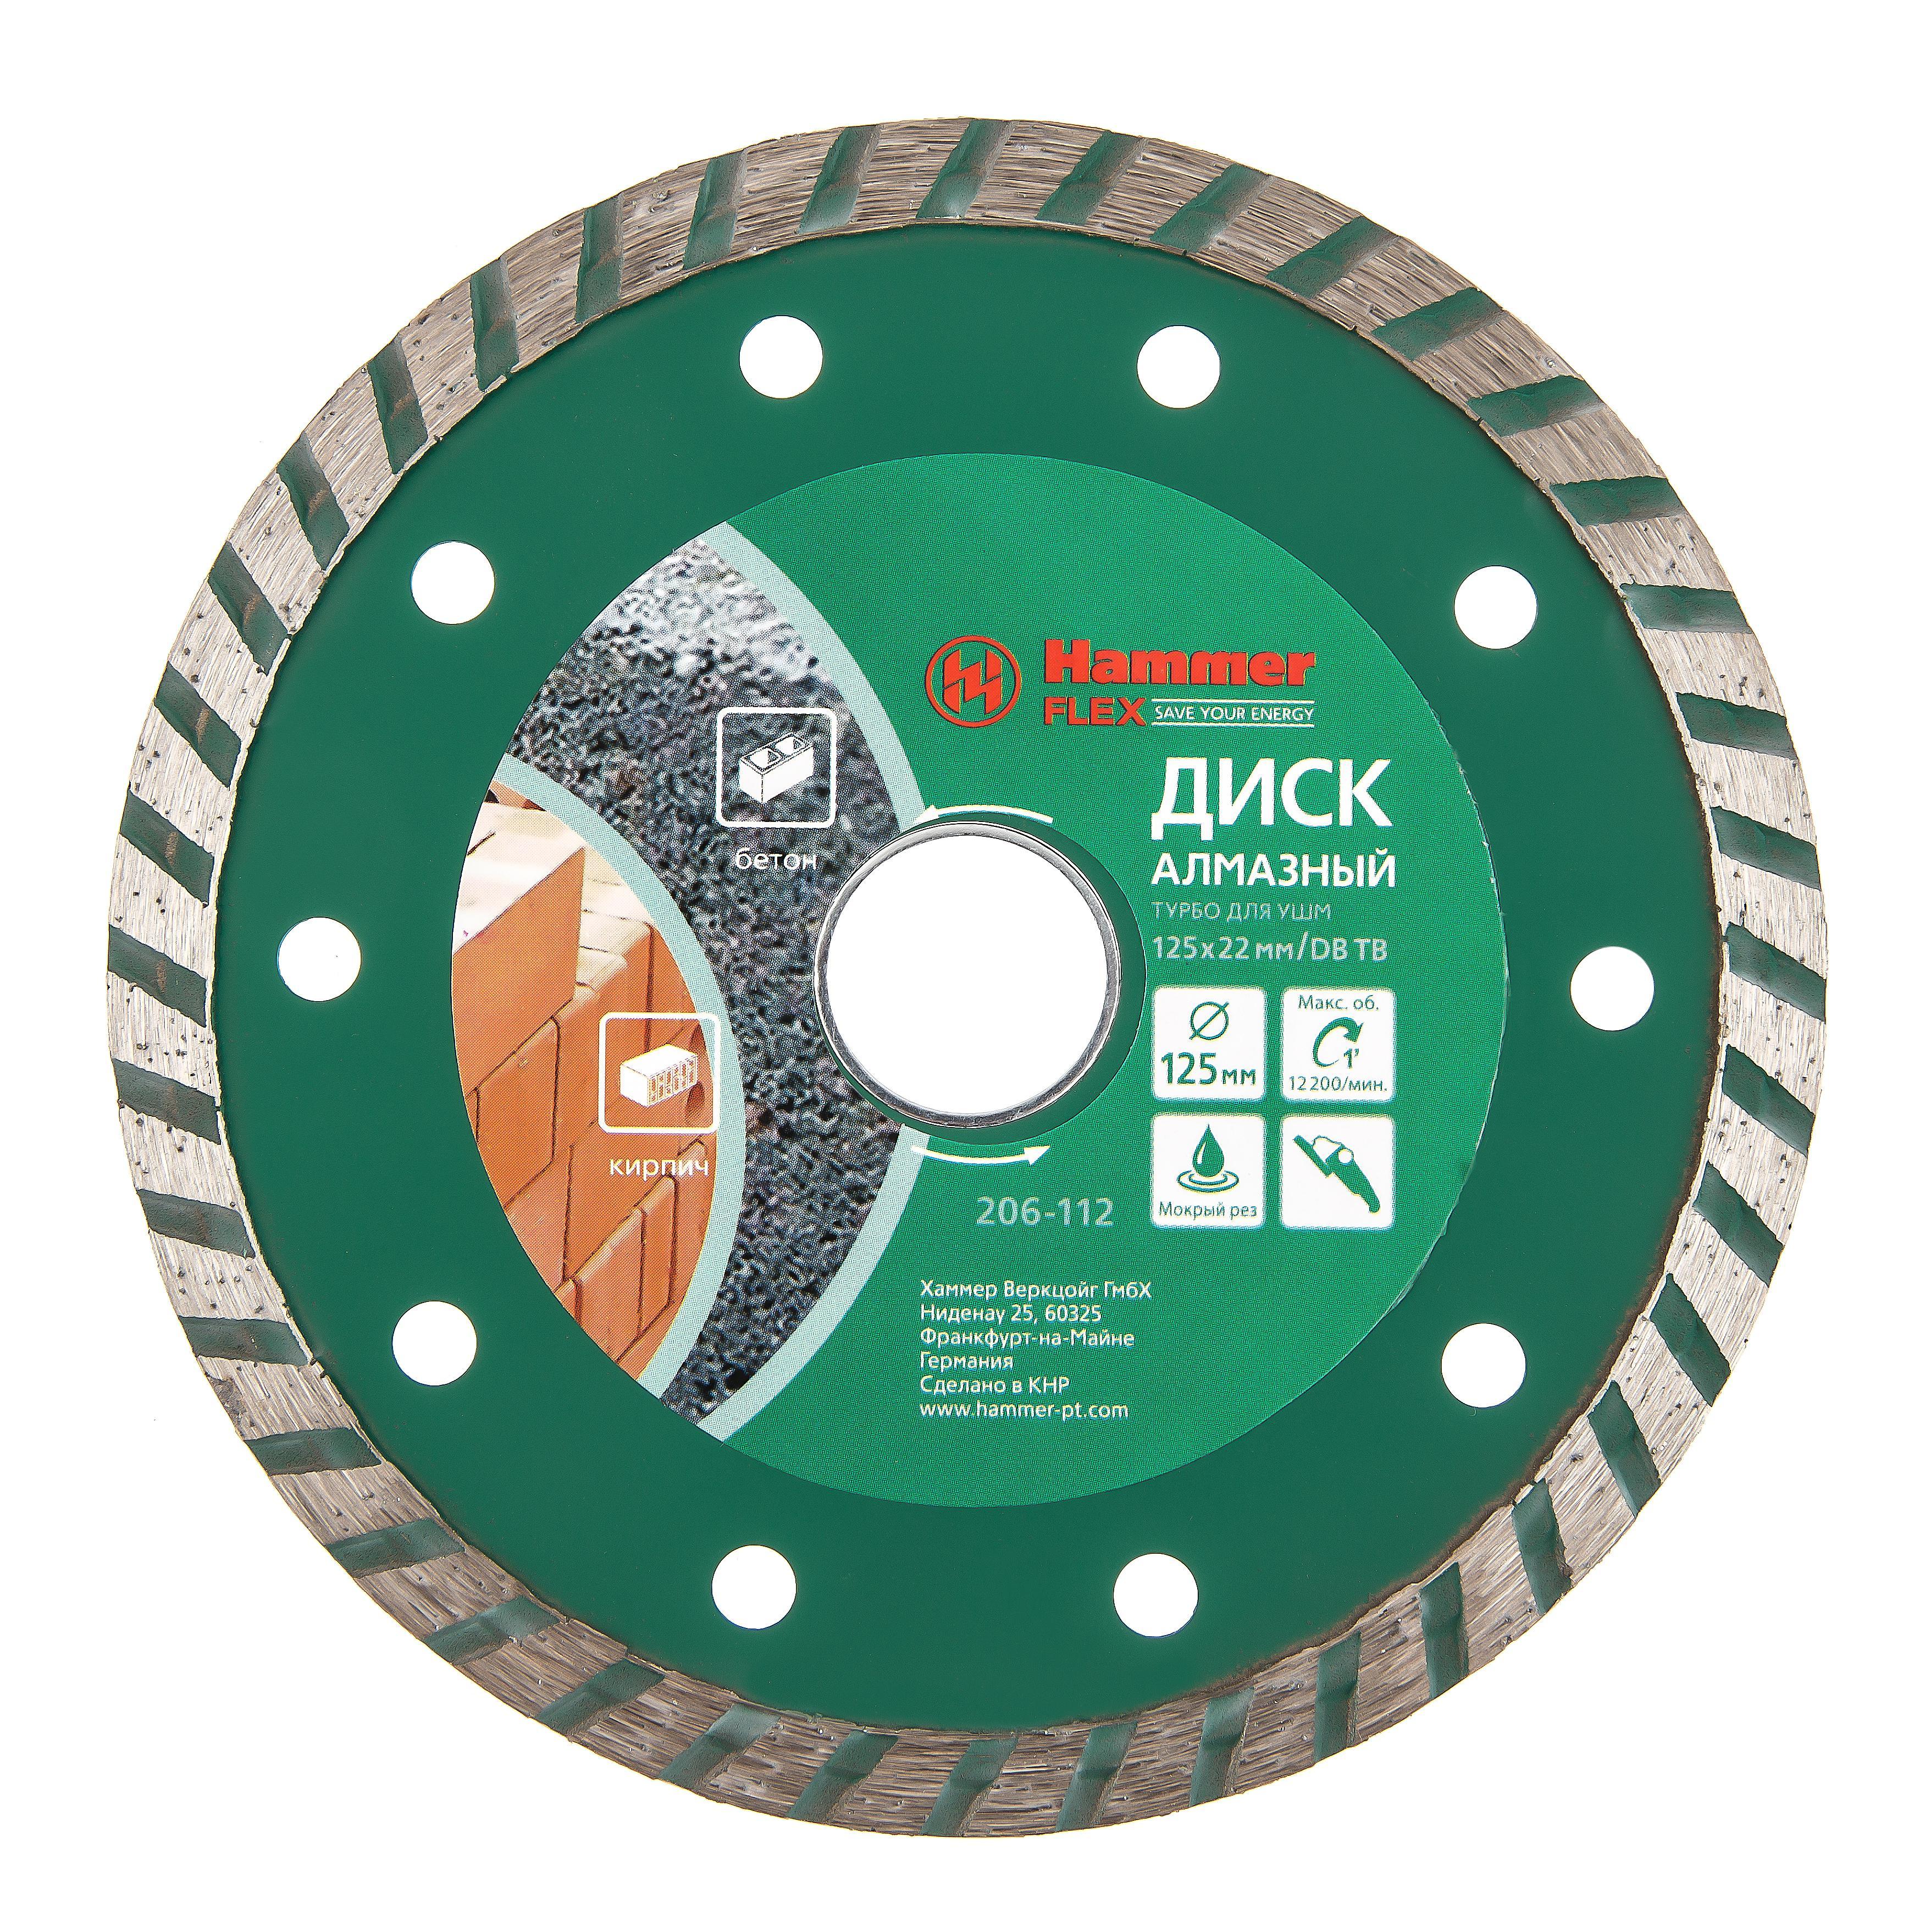 Круг алмазный Hammer 206-112 db tb диск алмазный diam 150х22 2мм master турбо 000160